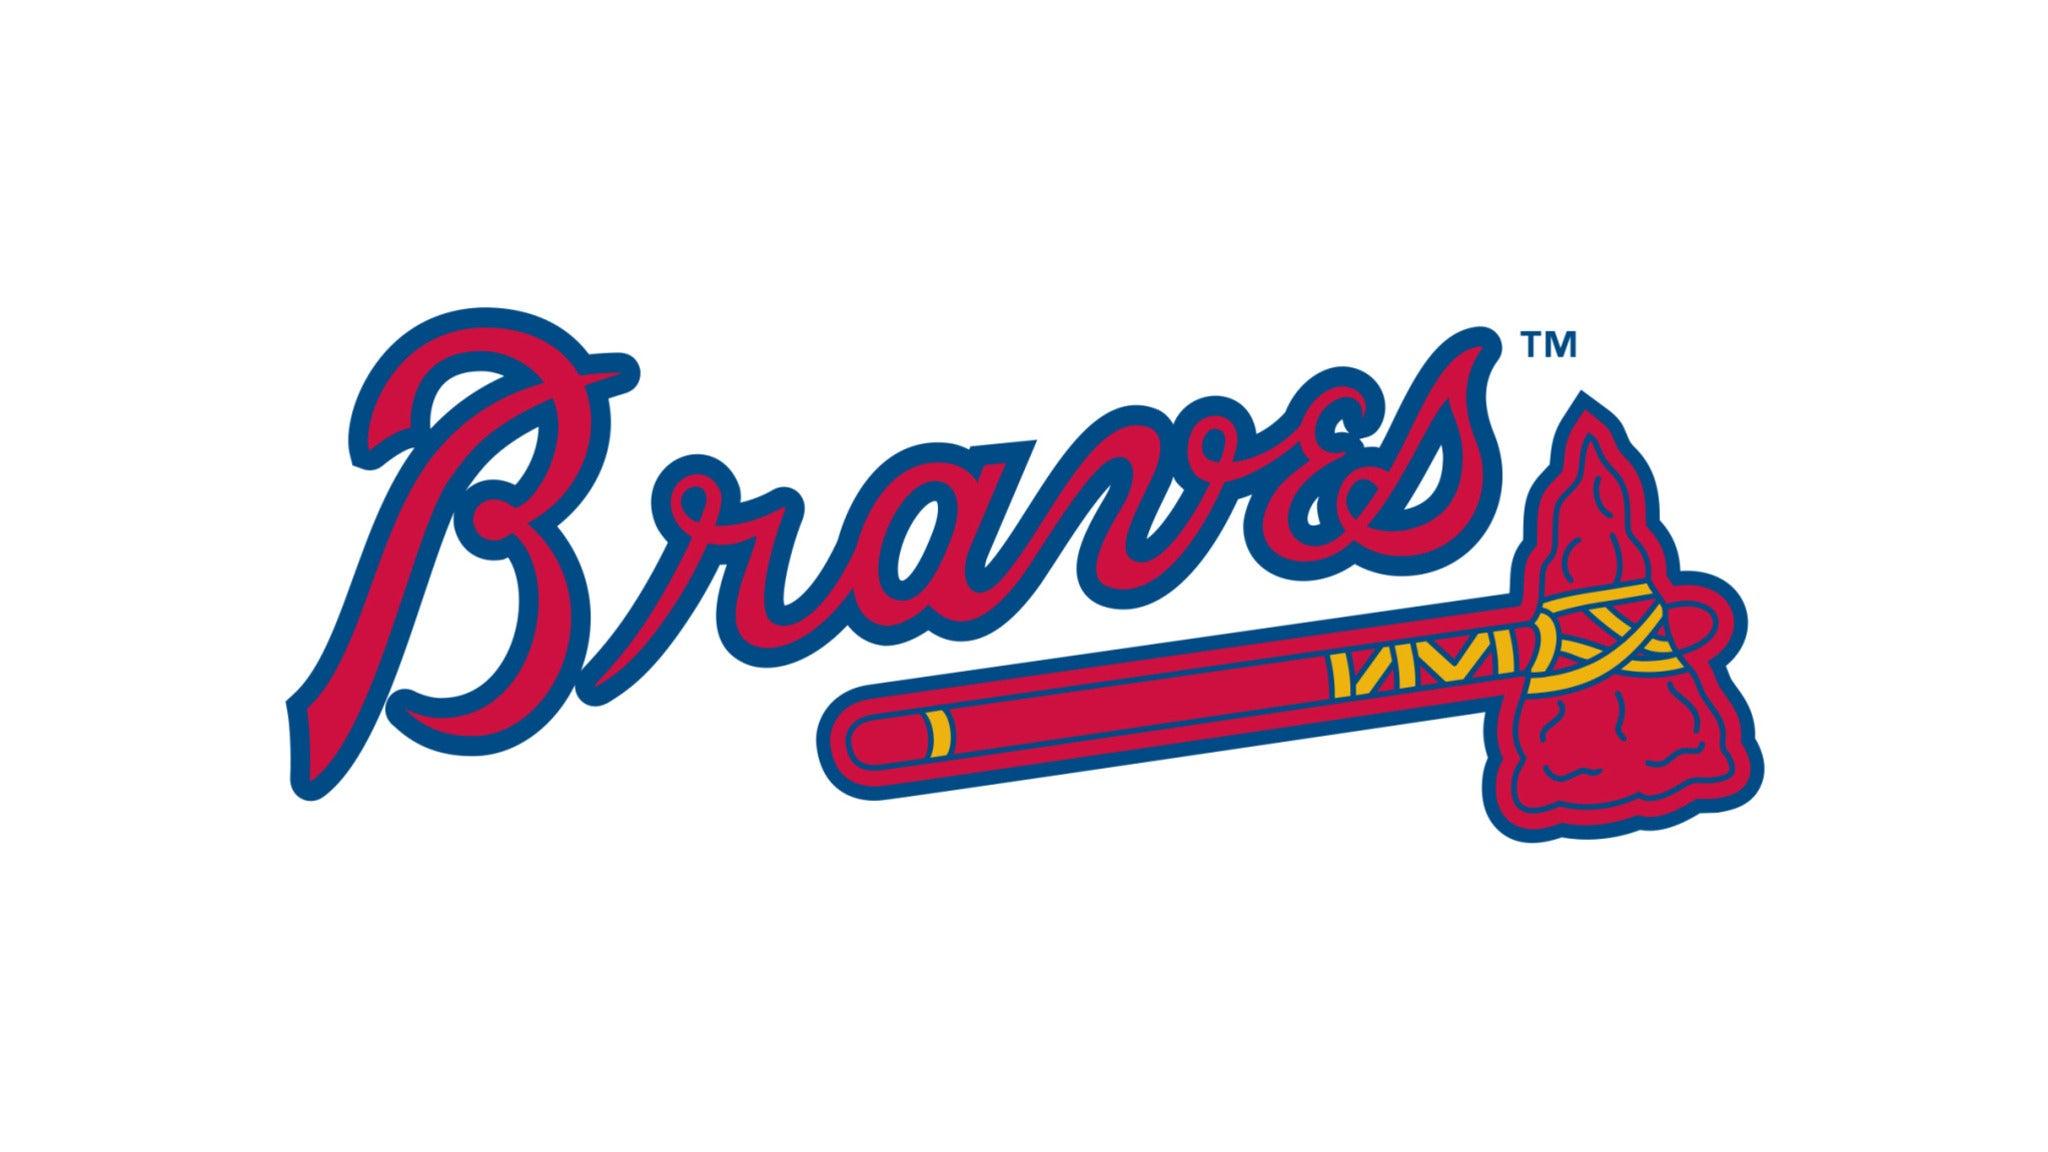 Atlanta Braves vs. Philadelphia Phillies at Turner Field